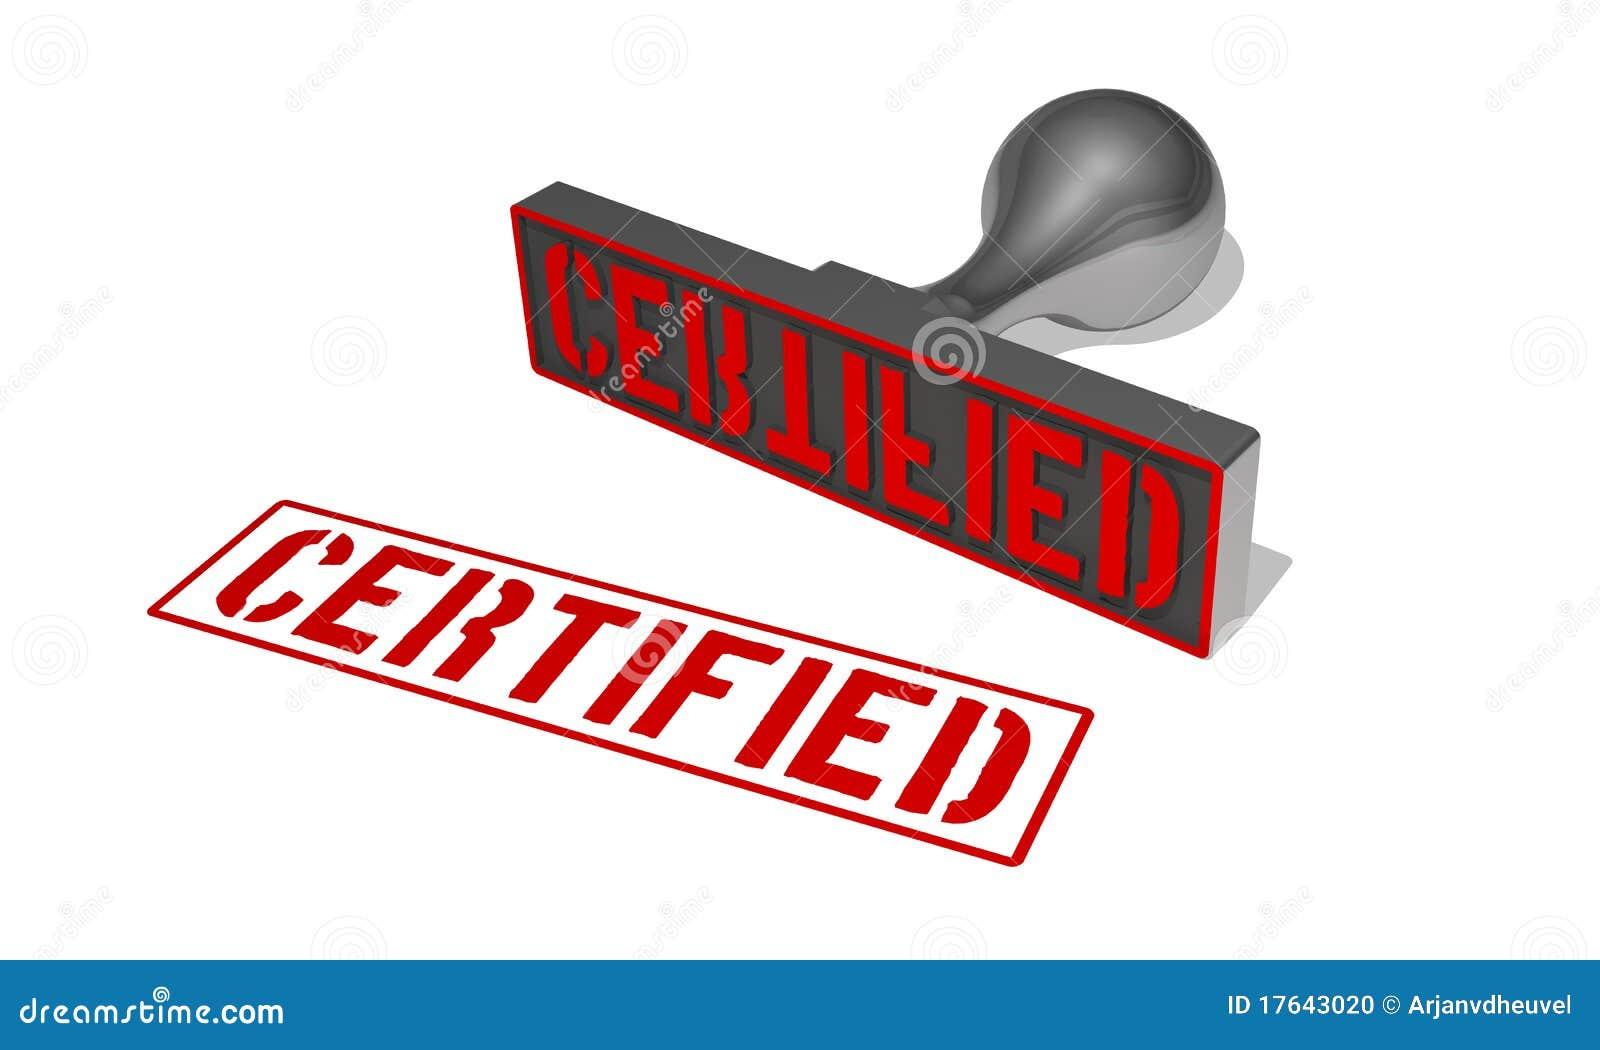 rubberstamp certified stock illustration illustration of